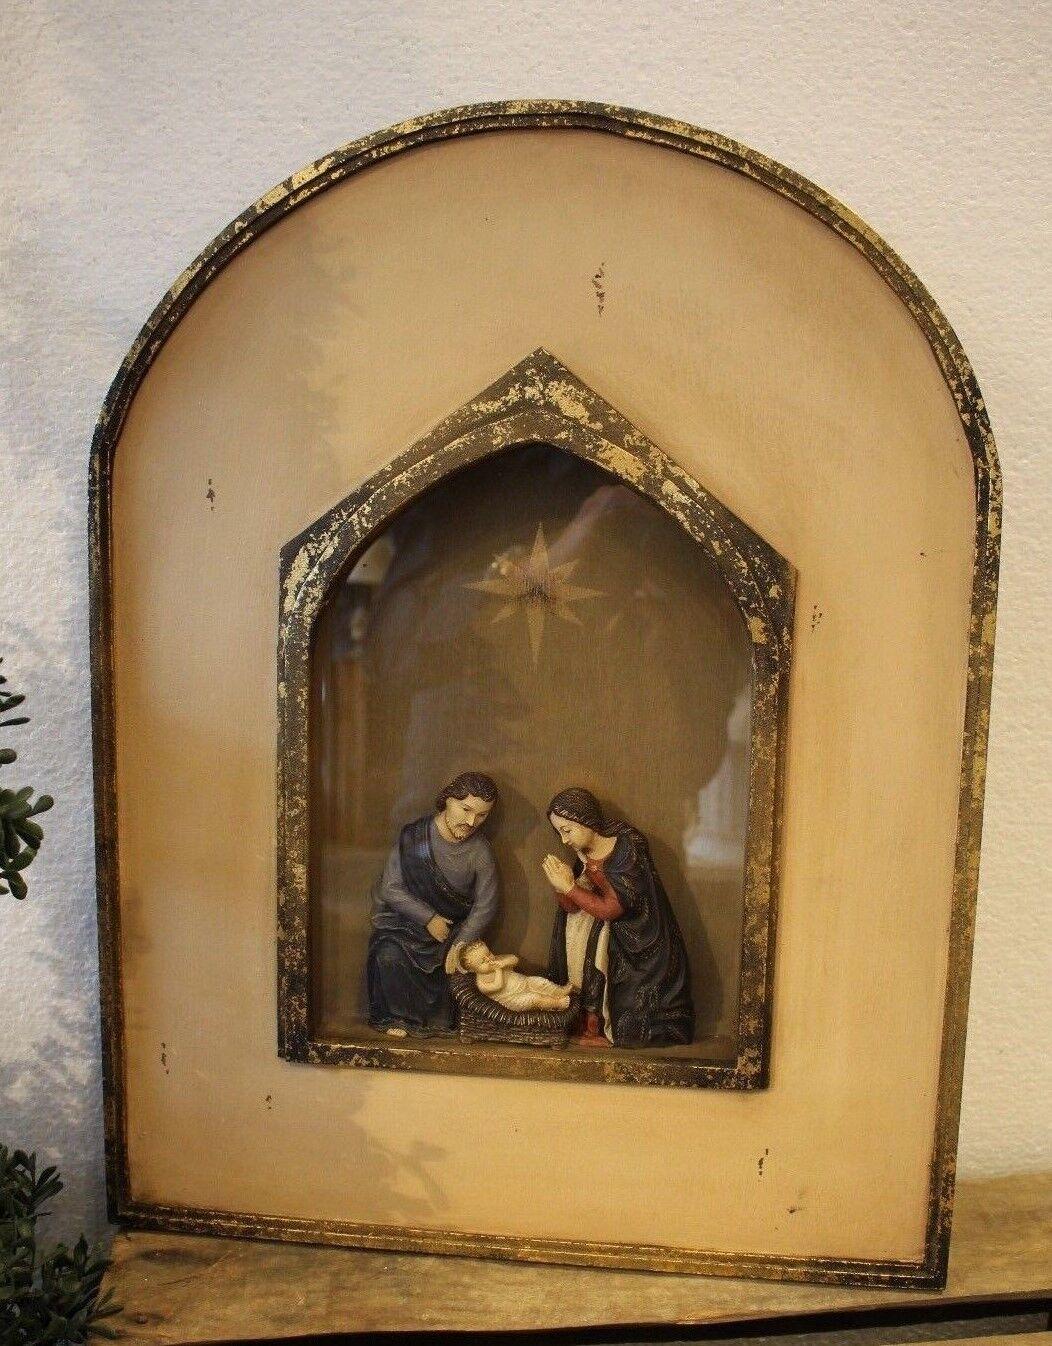 Preciosa imagen sagrada recuadro pesebre krippenfiguren Maria Josef jesús 51,5cm